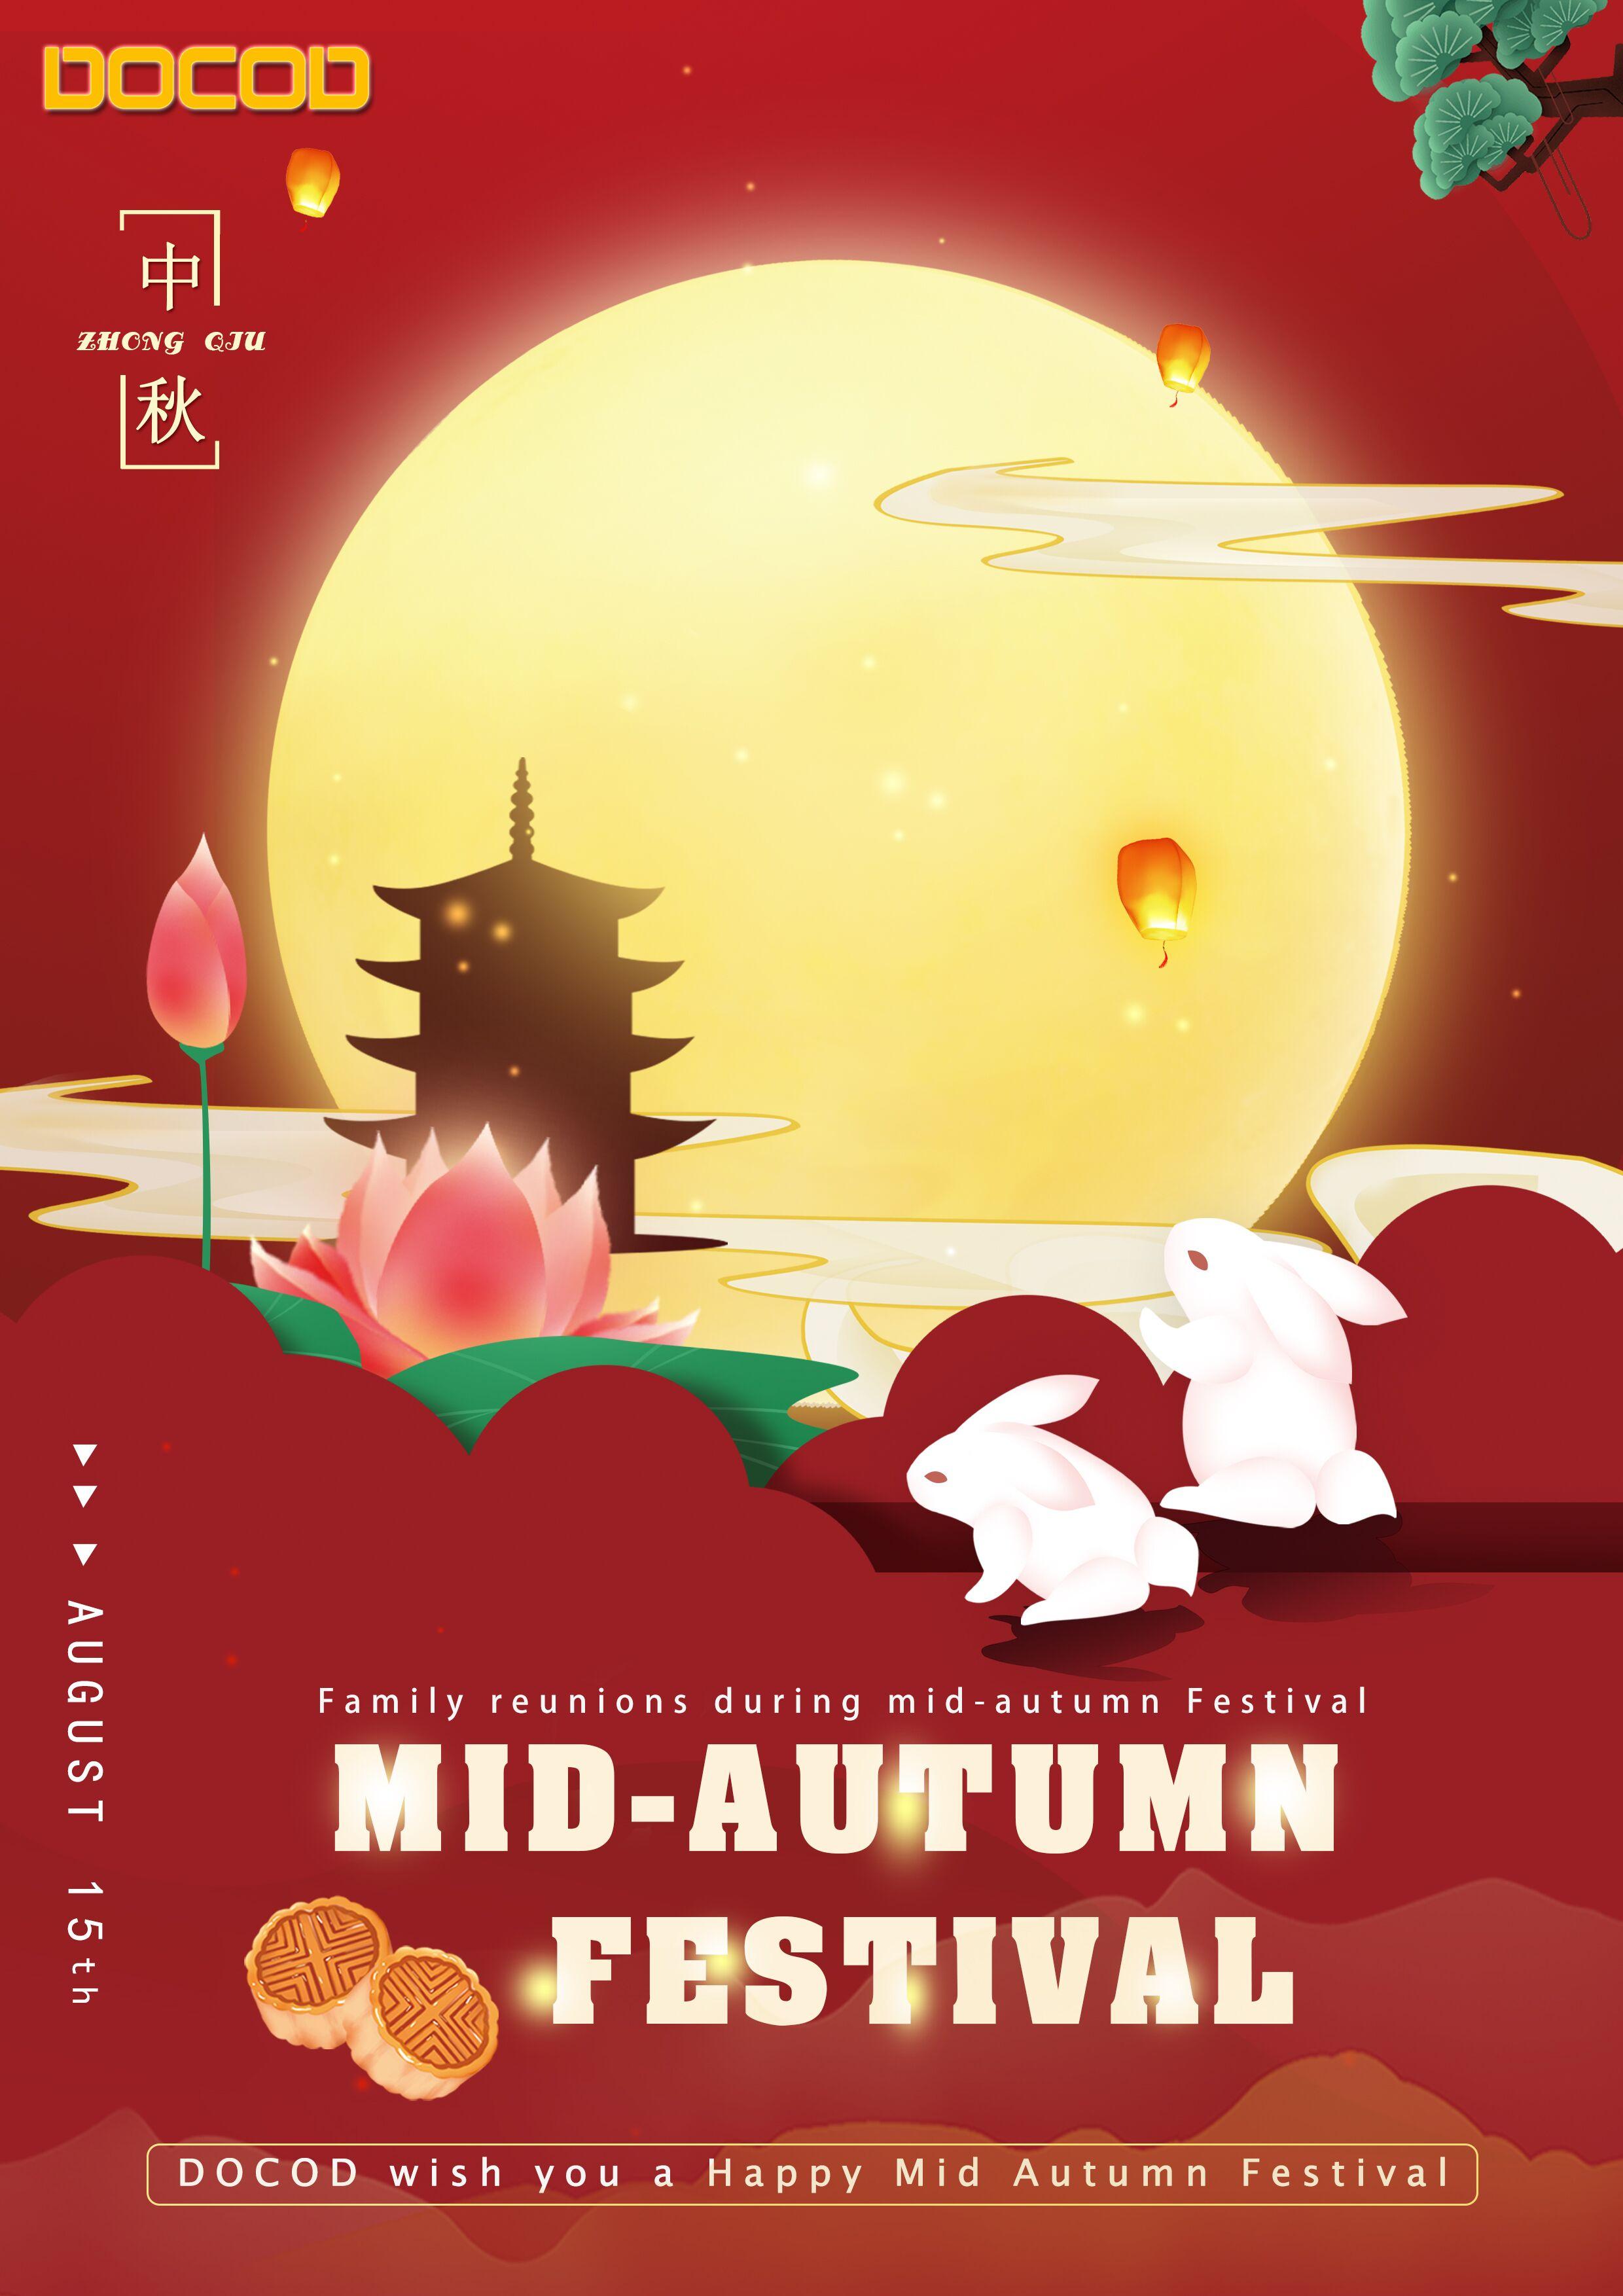 Happy Mid-Autumn Festival